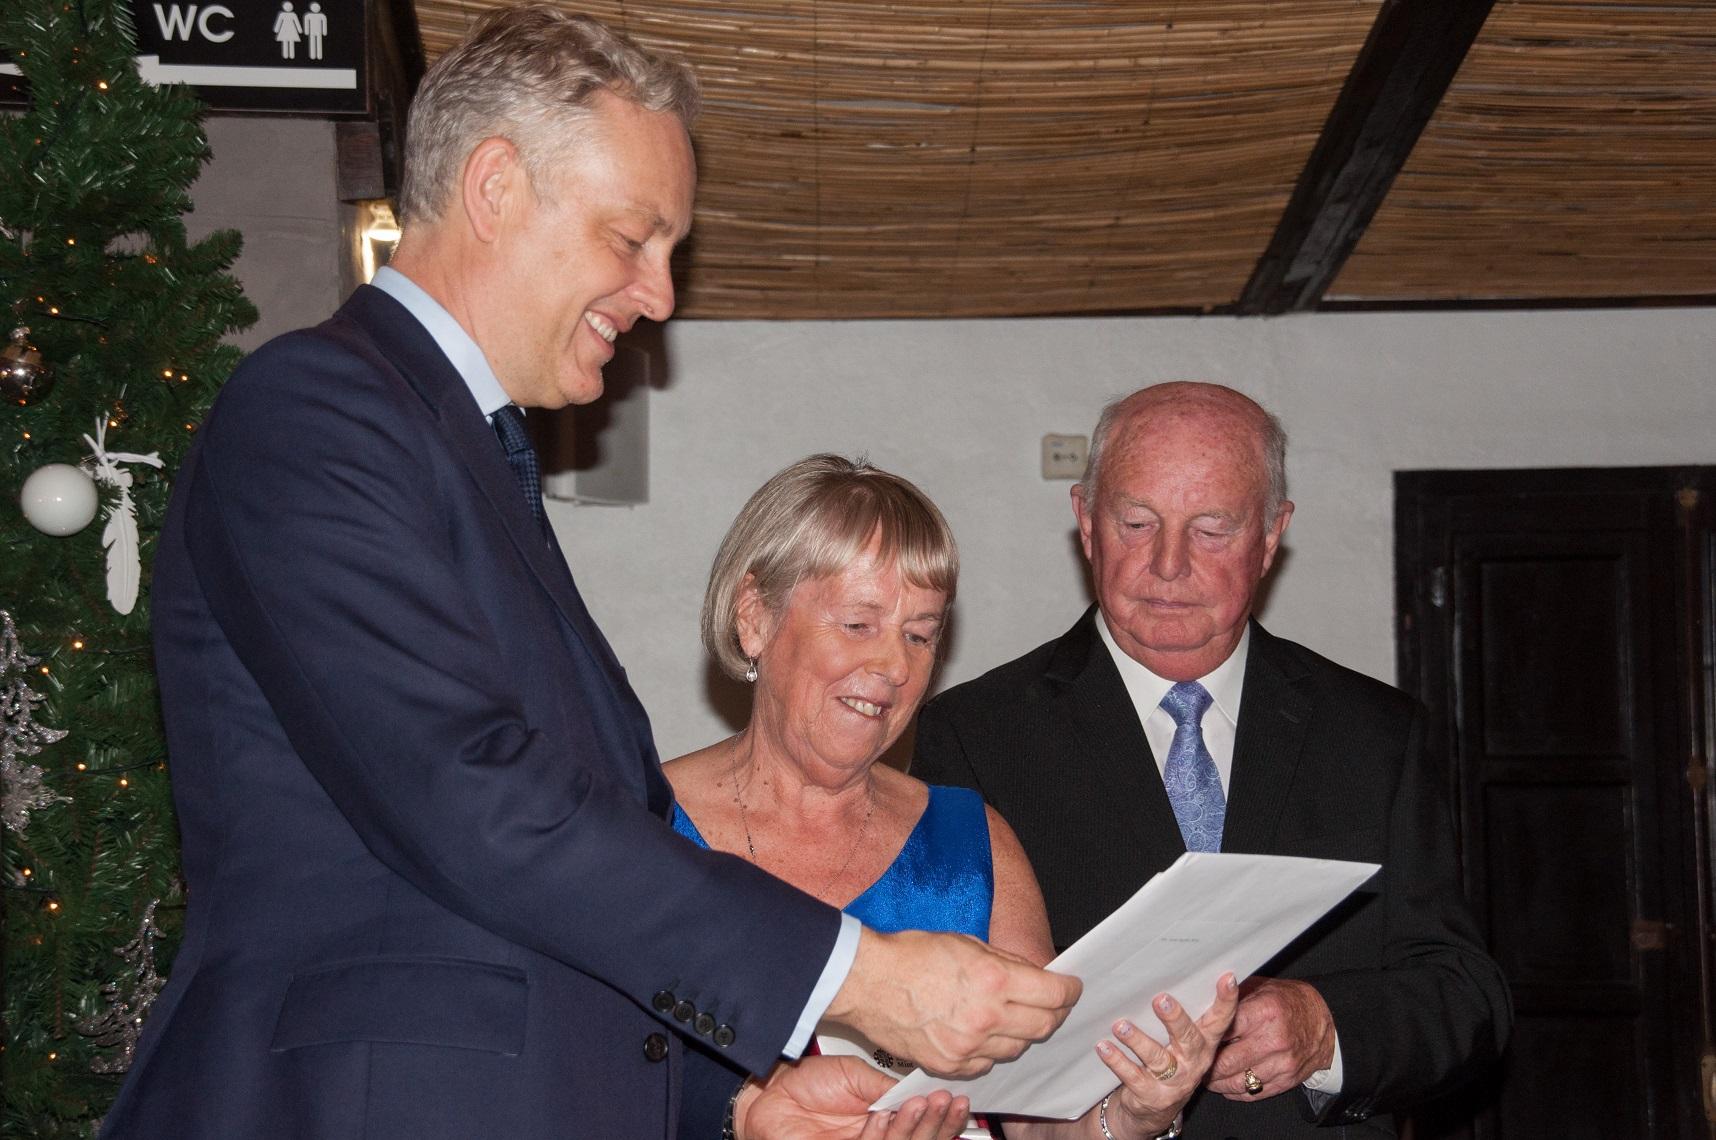 HMA Simon Manley presents Birthday Honours